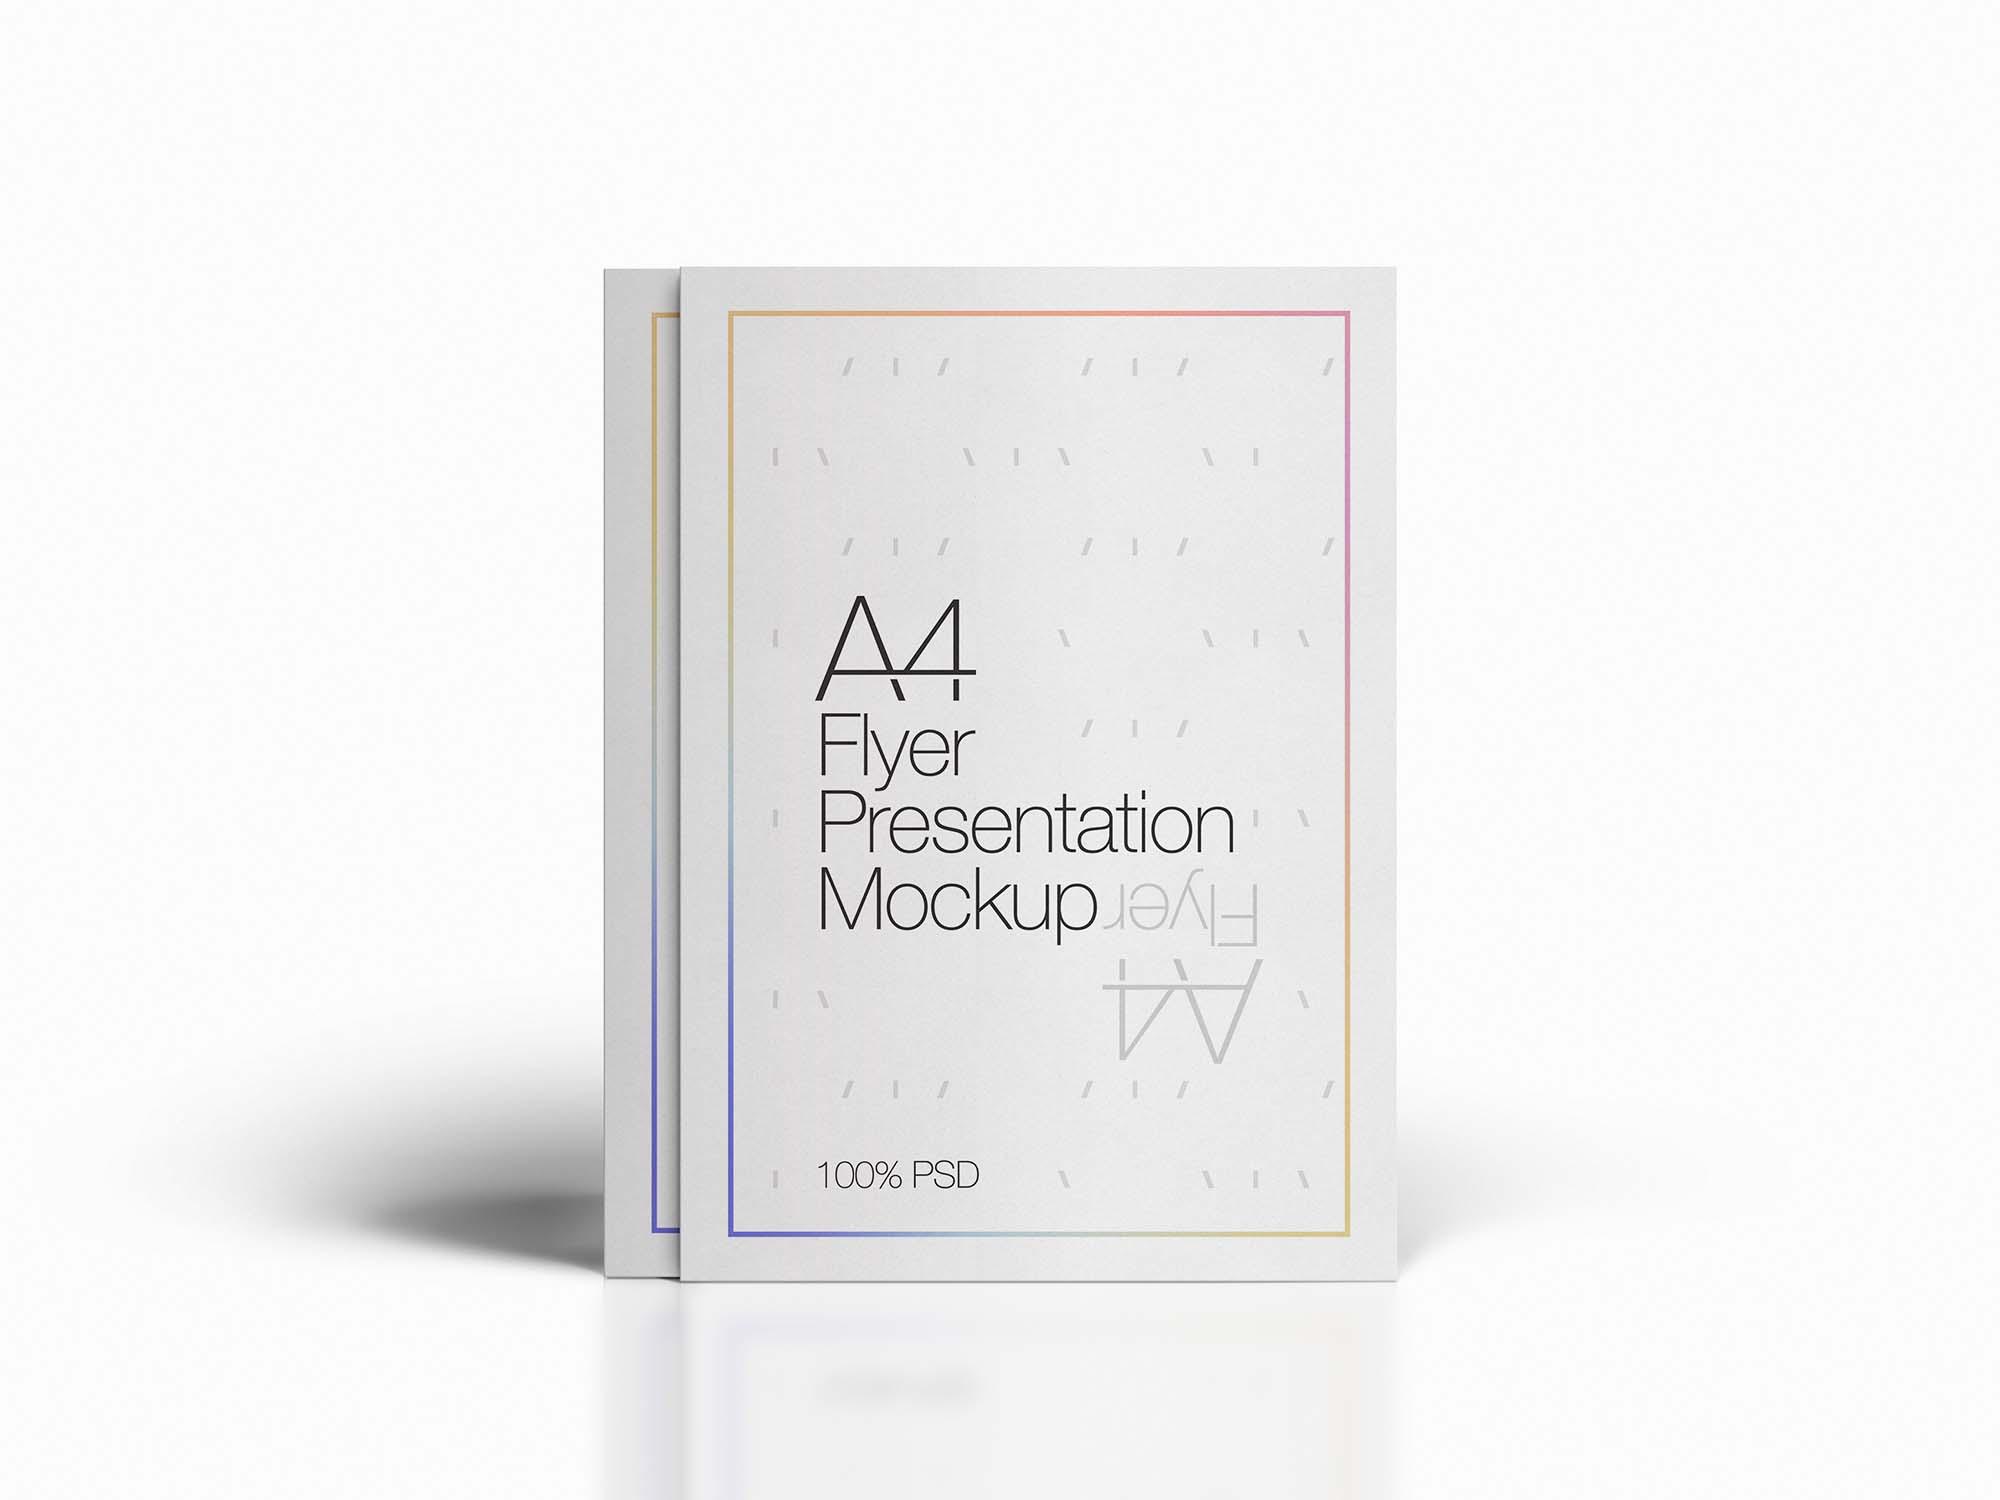 A4 Flyer Presentation Mockup